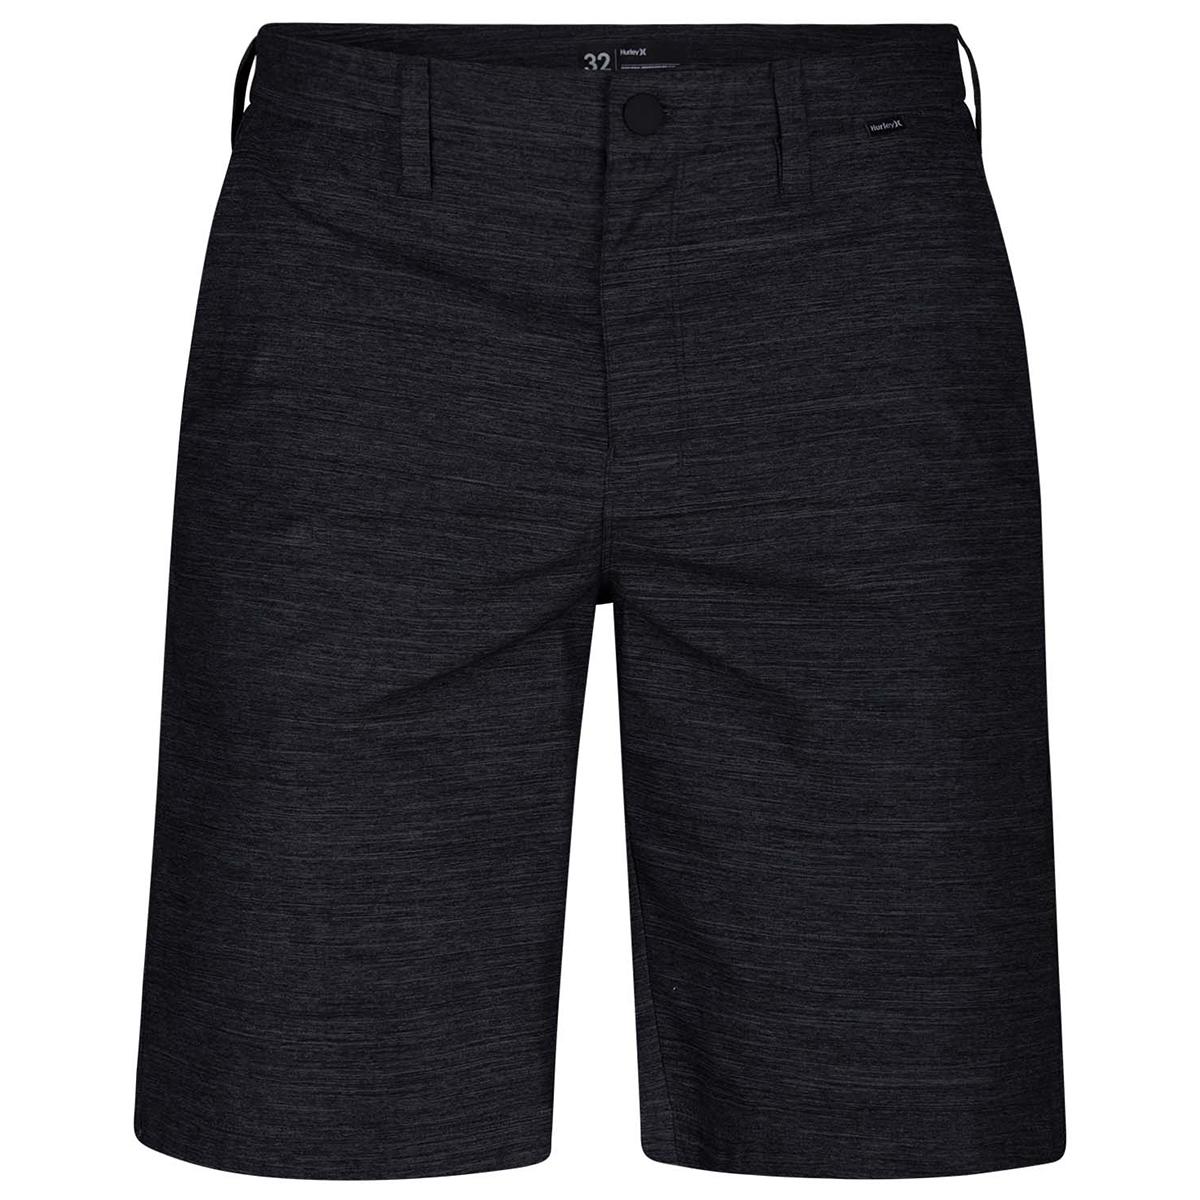 Hurley Men's Dri-Fit Breathe Chino Shorts, 21 In. - Black, 30